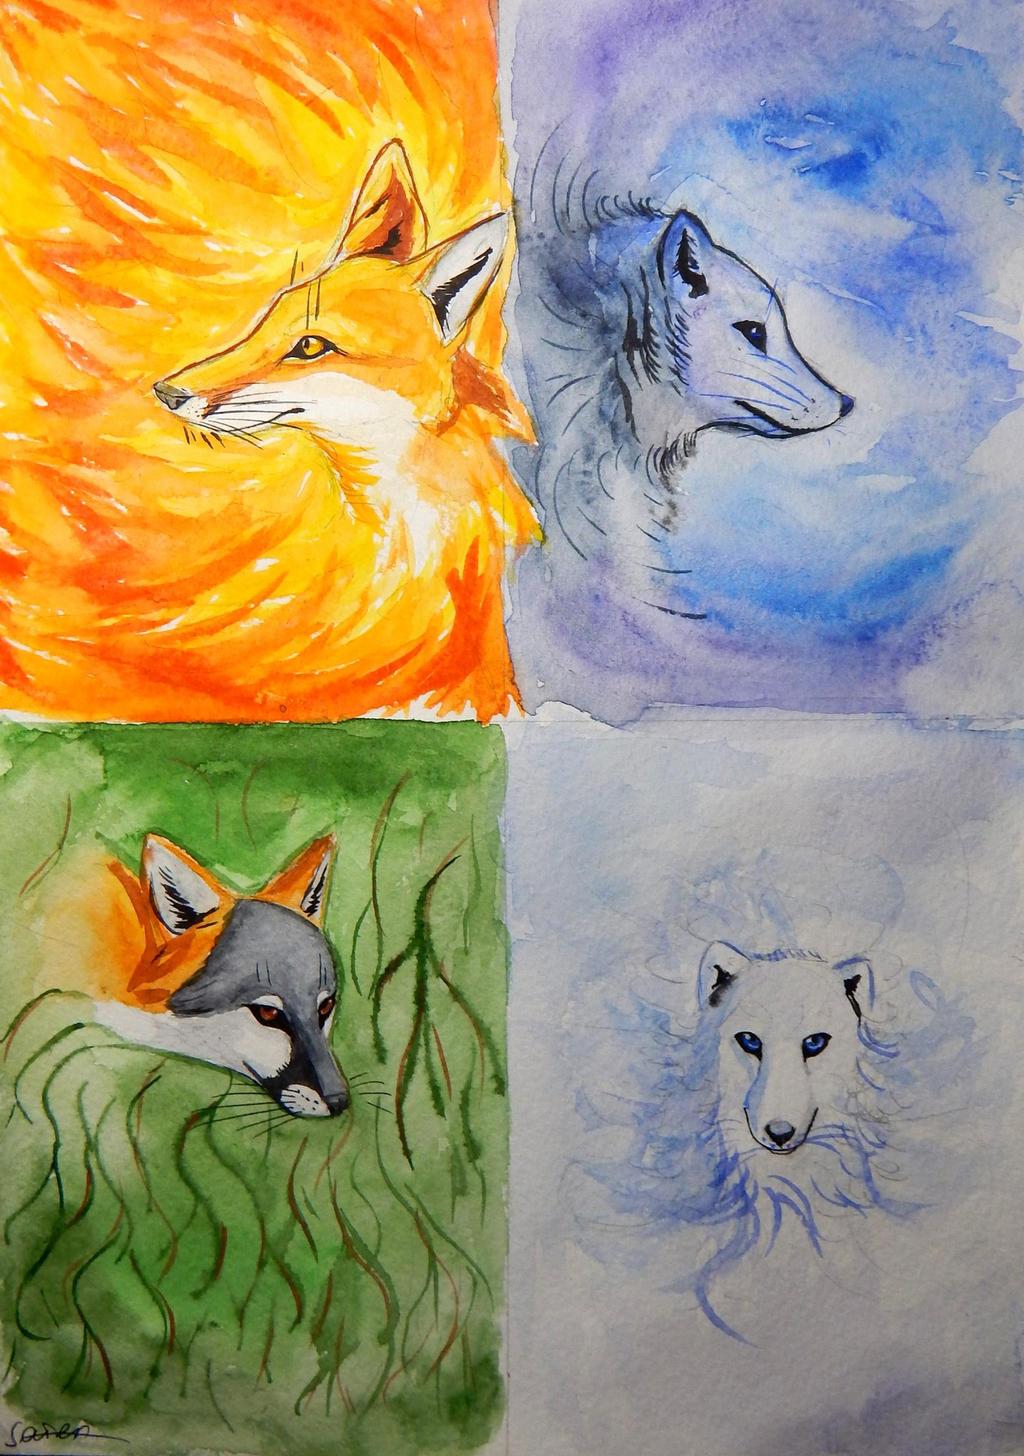 4 Elements Of Art : Four elements by tavera s on deviantart